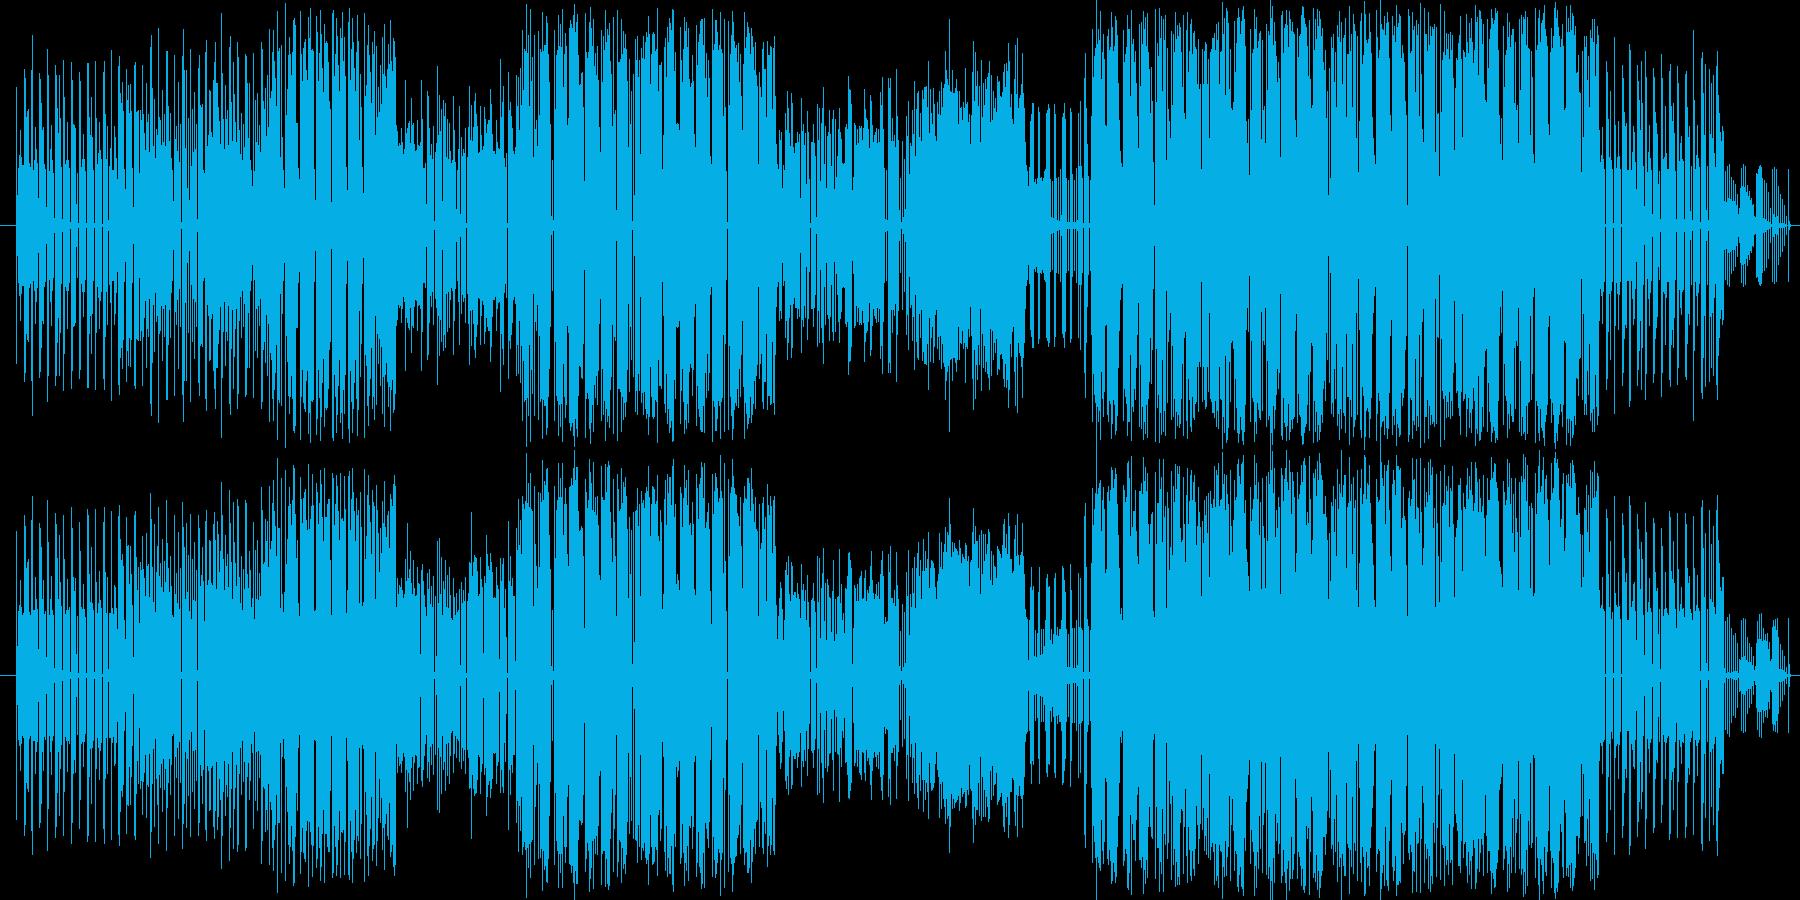 KORG DS-10をメインリズムマシ…の再生済みの波形